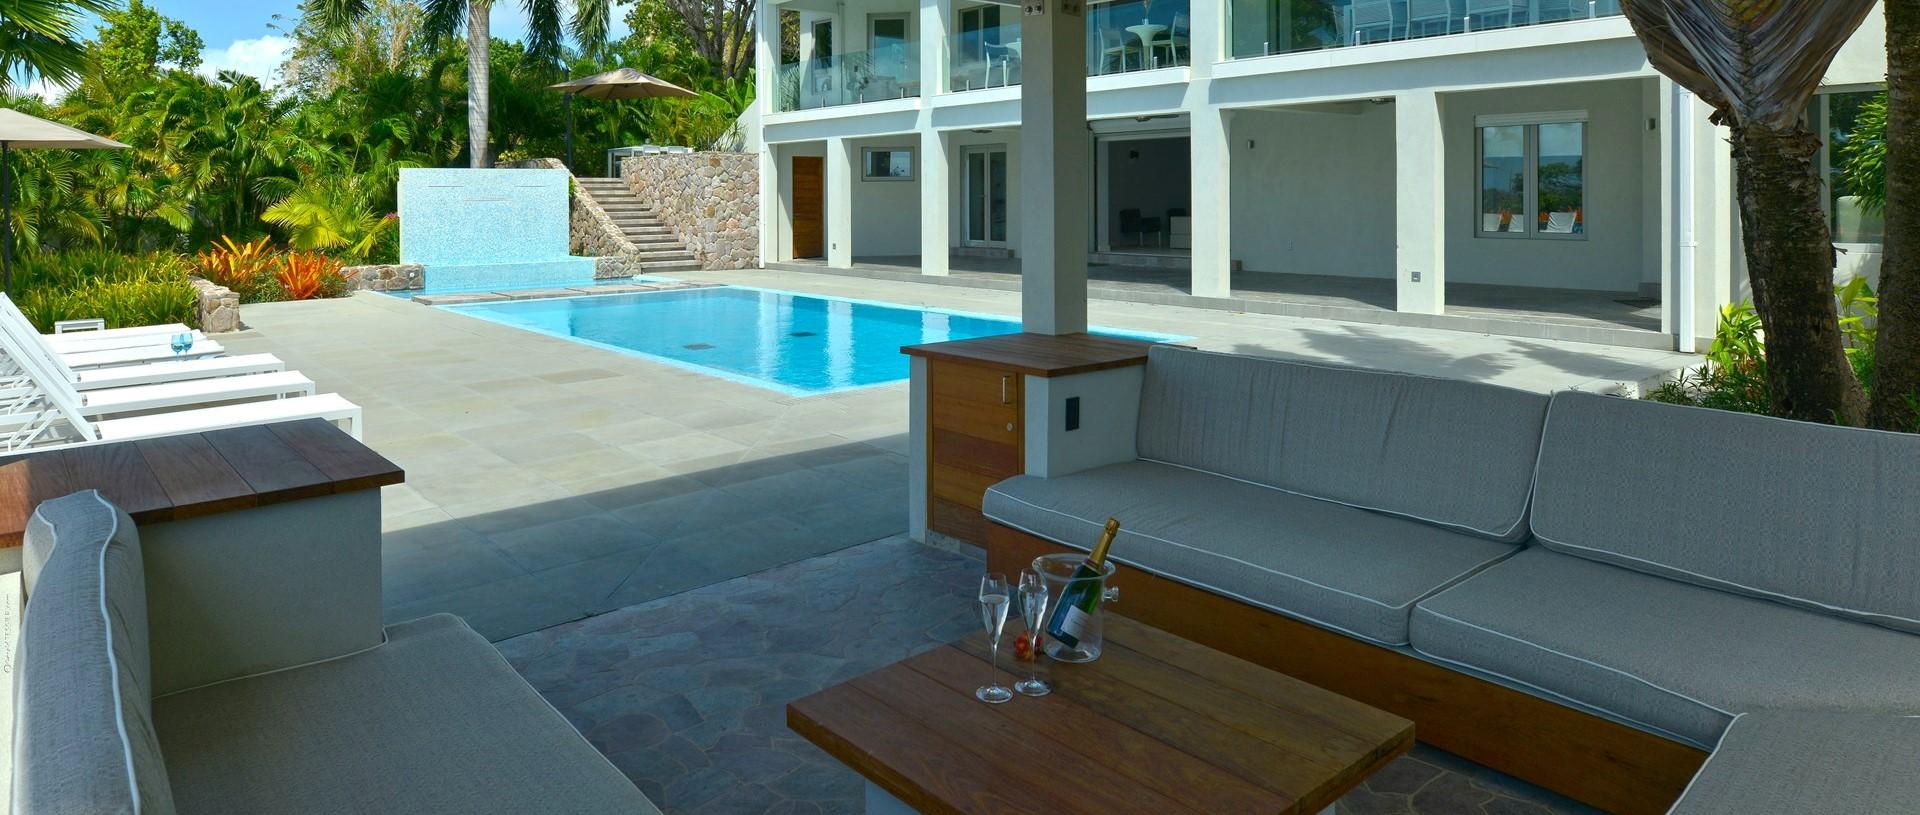 retreat-villa-nevis-poolside-cabana